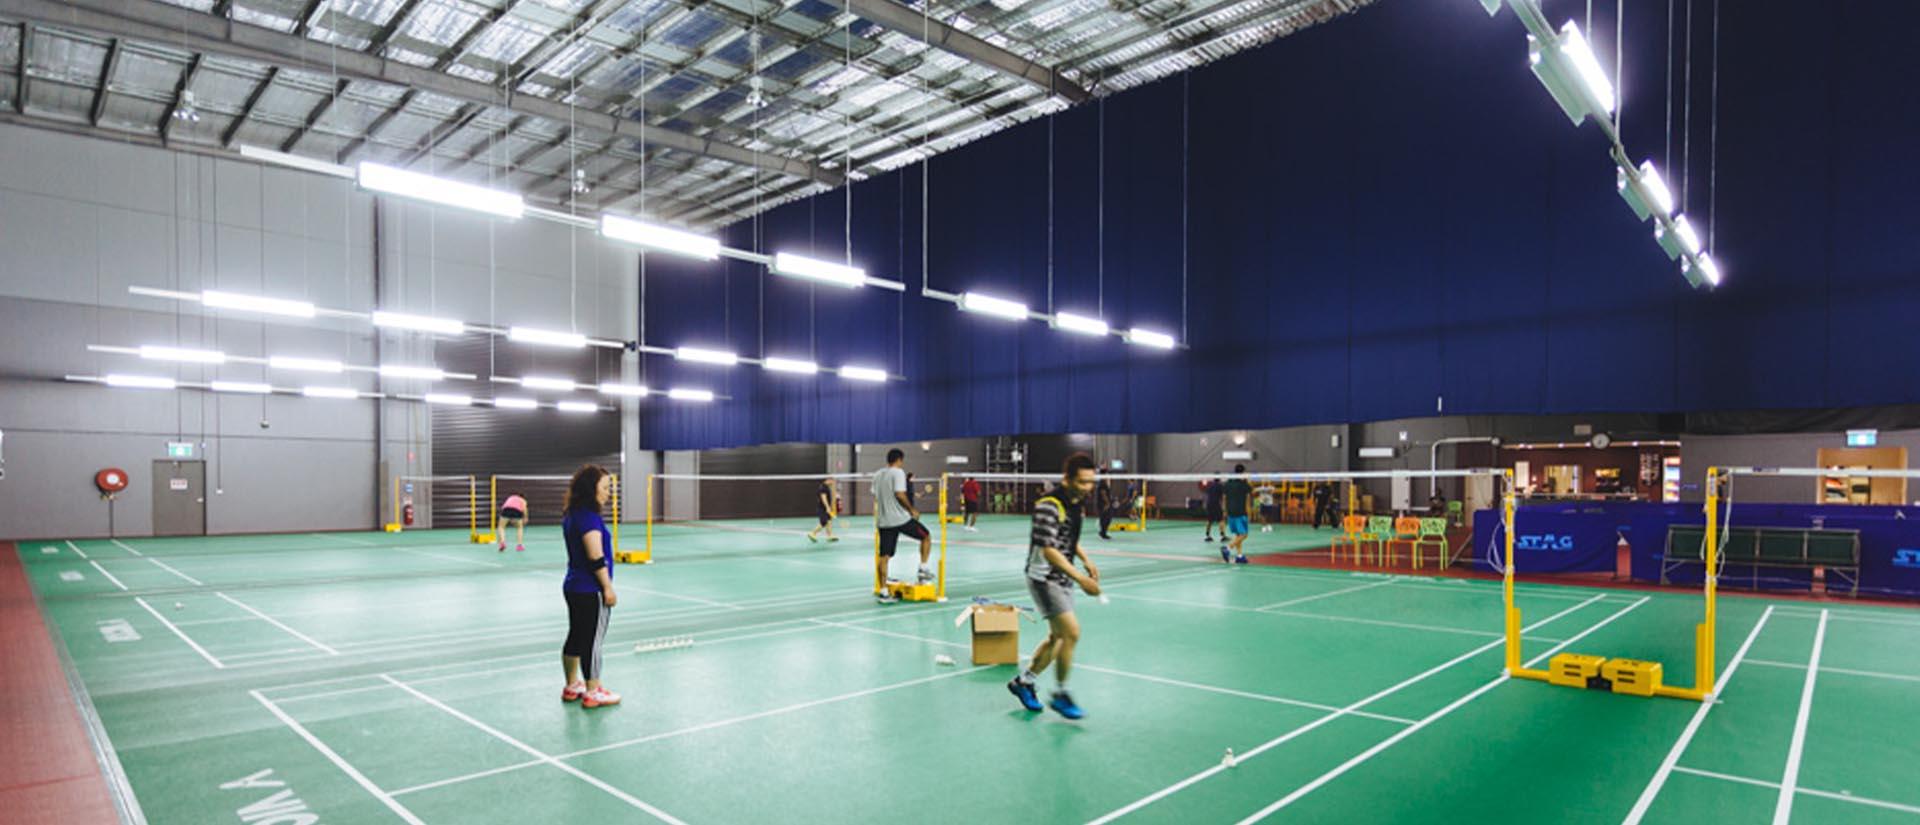 Projects-Architecture_Pro-Fit Badminton 2